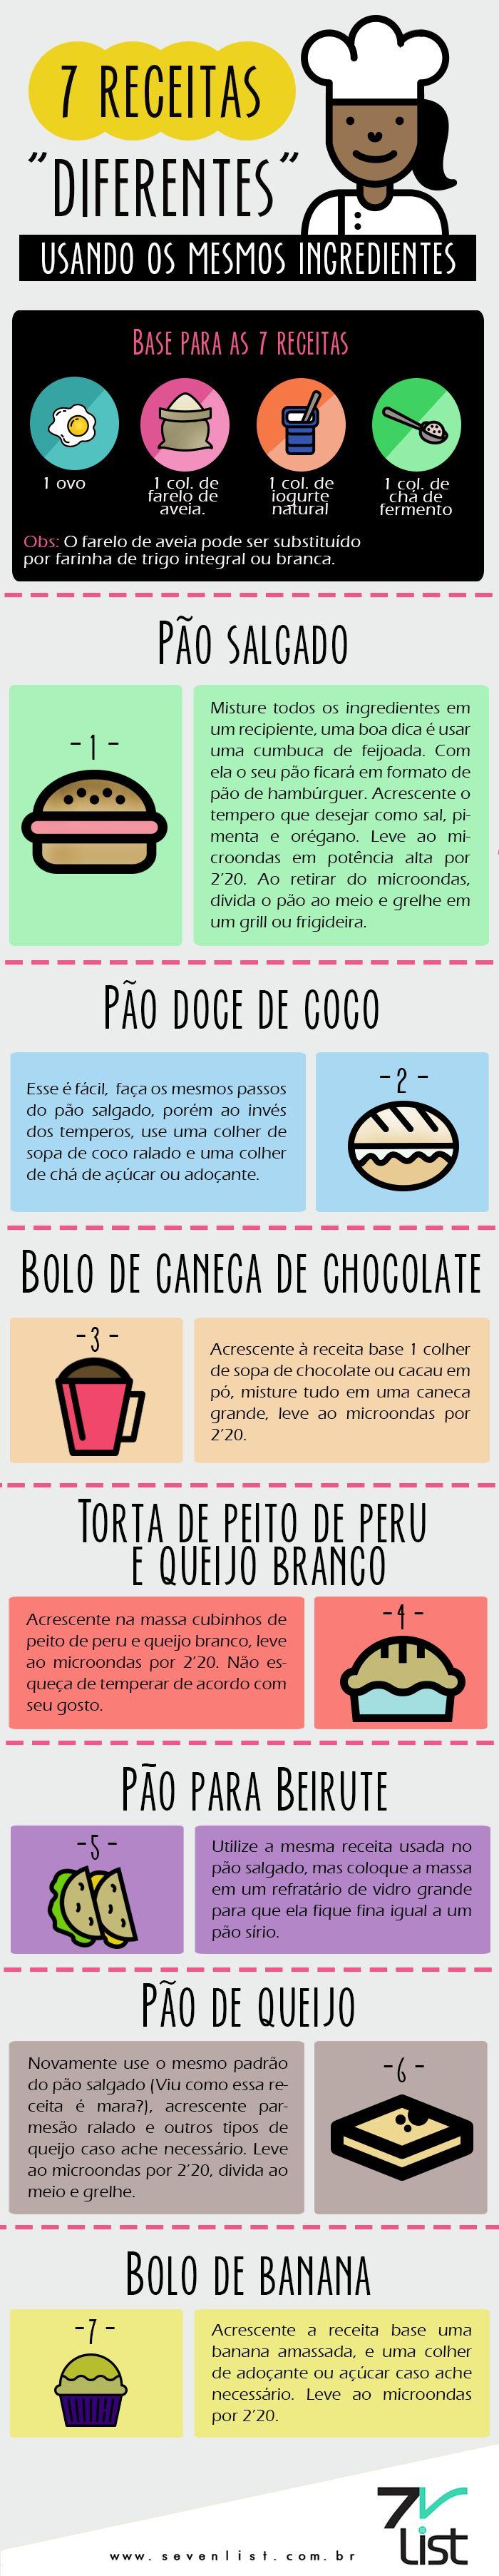 #Design #Infográfico #Receitas #Fit #Basic #Fast #Cake #Bread